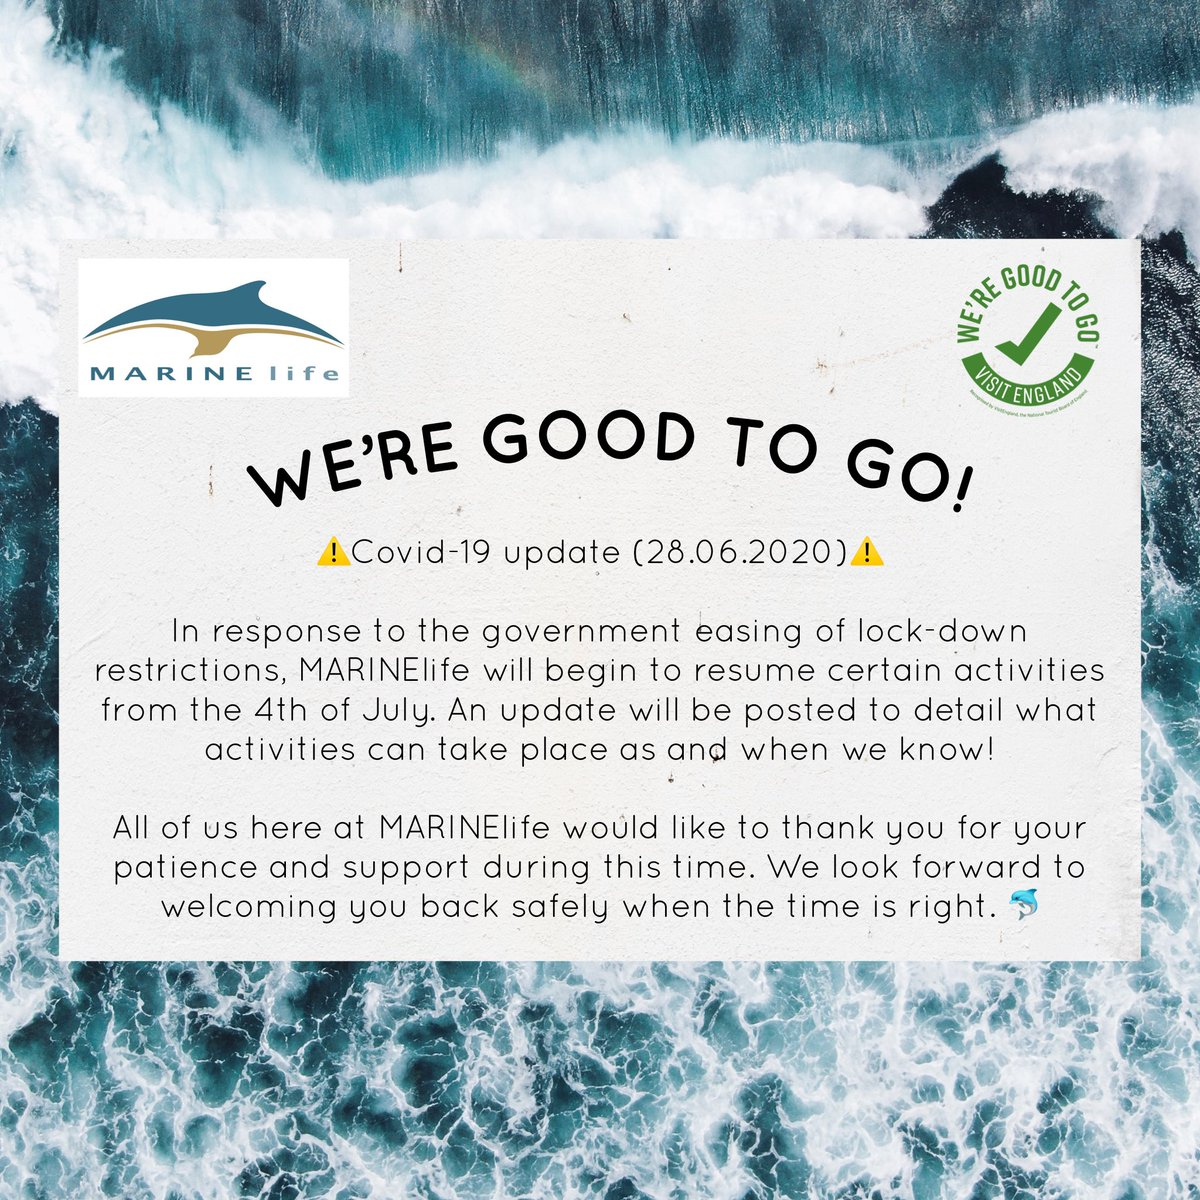 #wereGoodToGo #GoodToGo #charitytuesday #marinelife